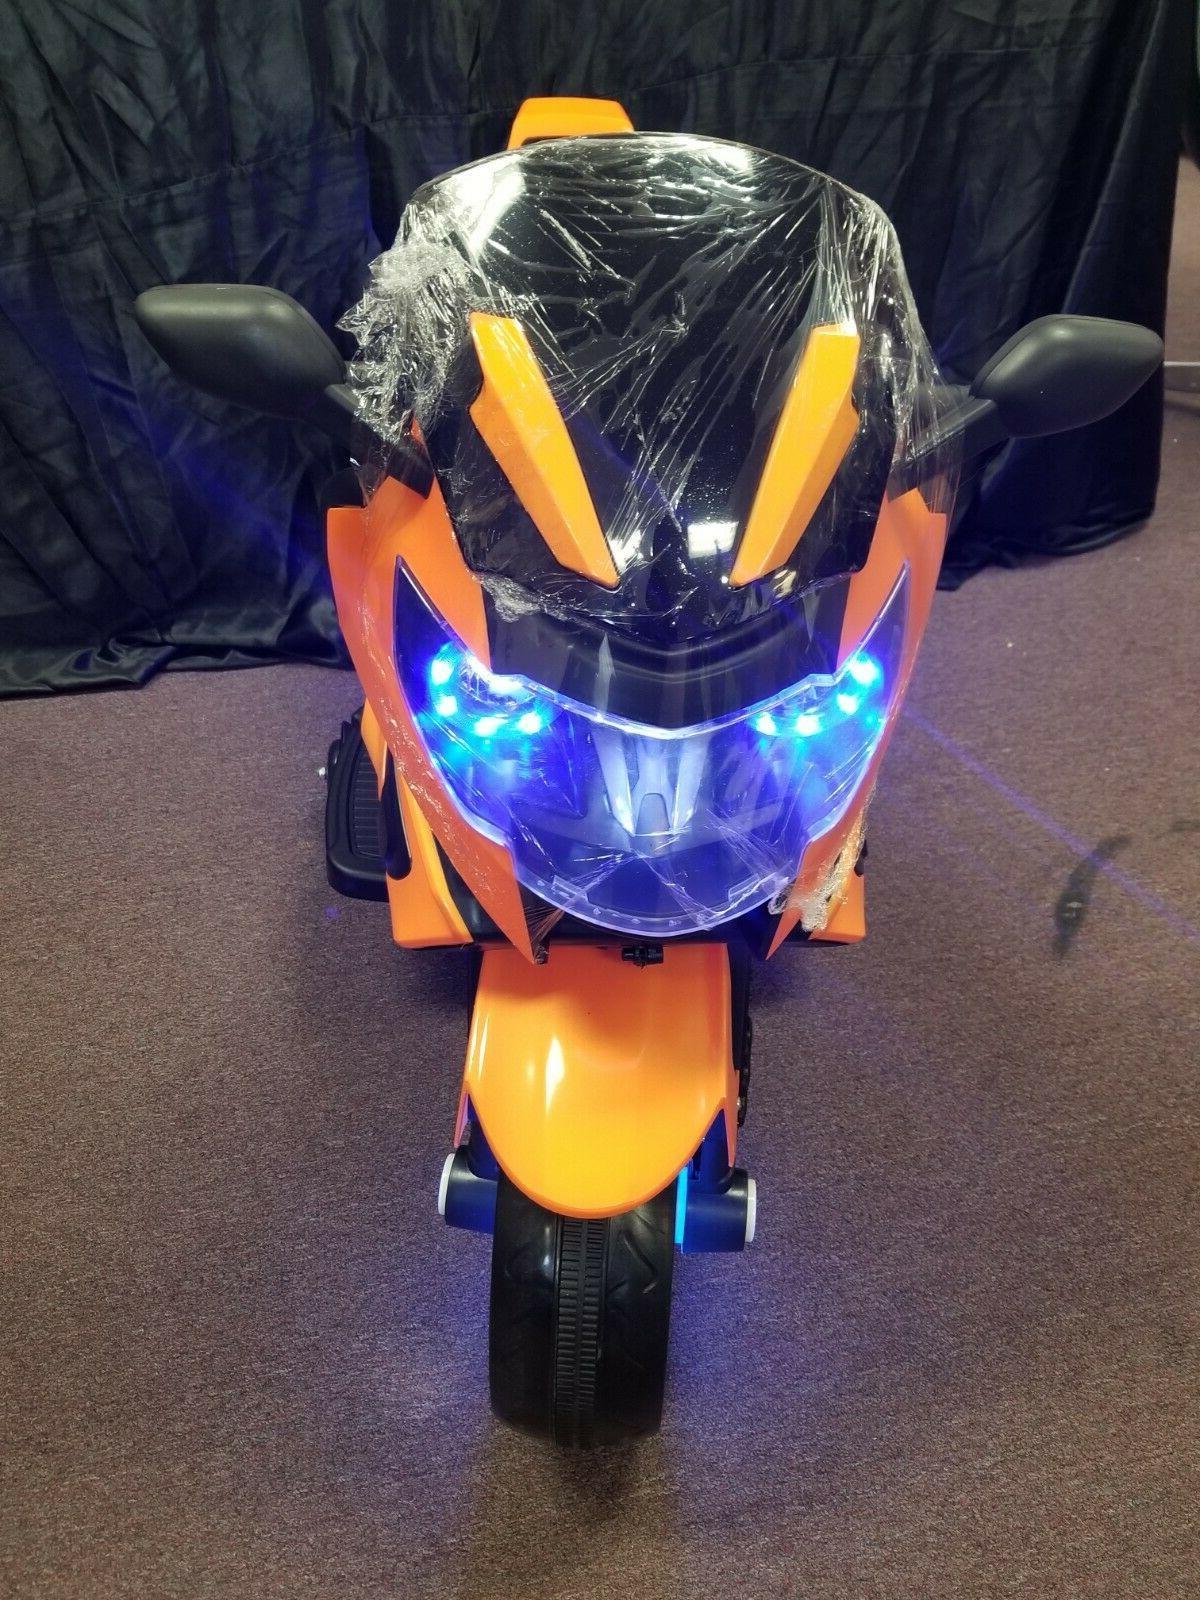 New LED KIDS RIDE ON SPORTS power wheel